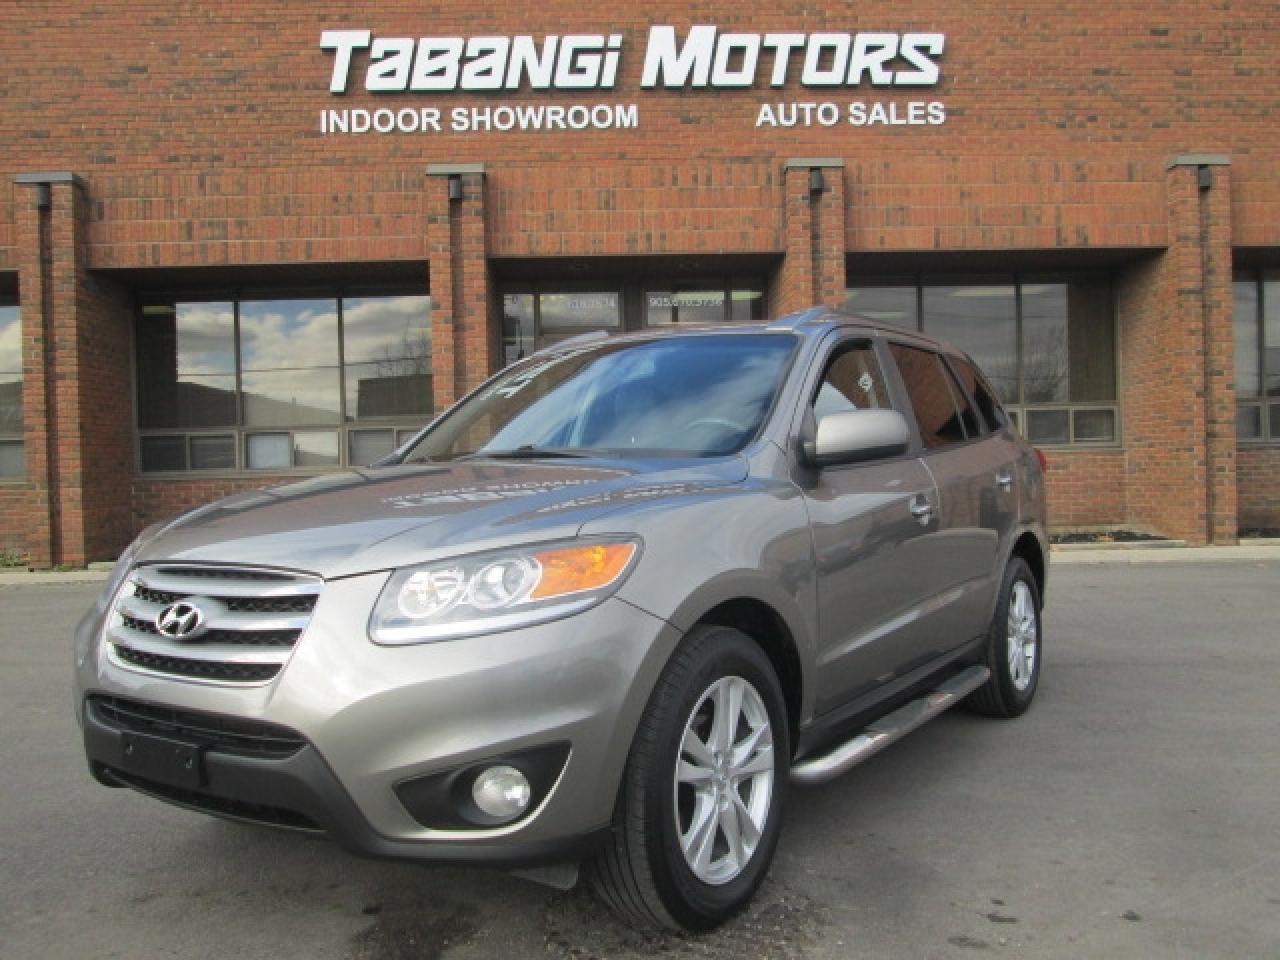 2012 Hyundai Santa Fe AWD | NAVIGATION | BACK UP CAMERA | LEATHER | SUNROOF